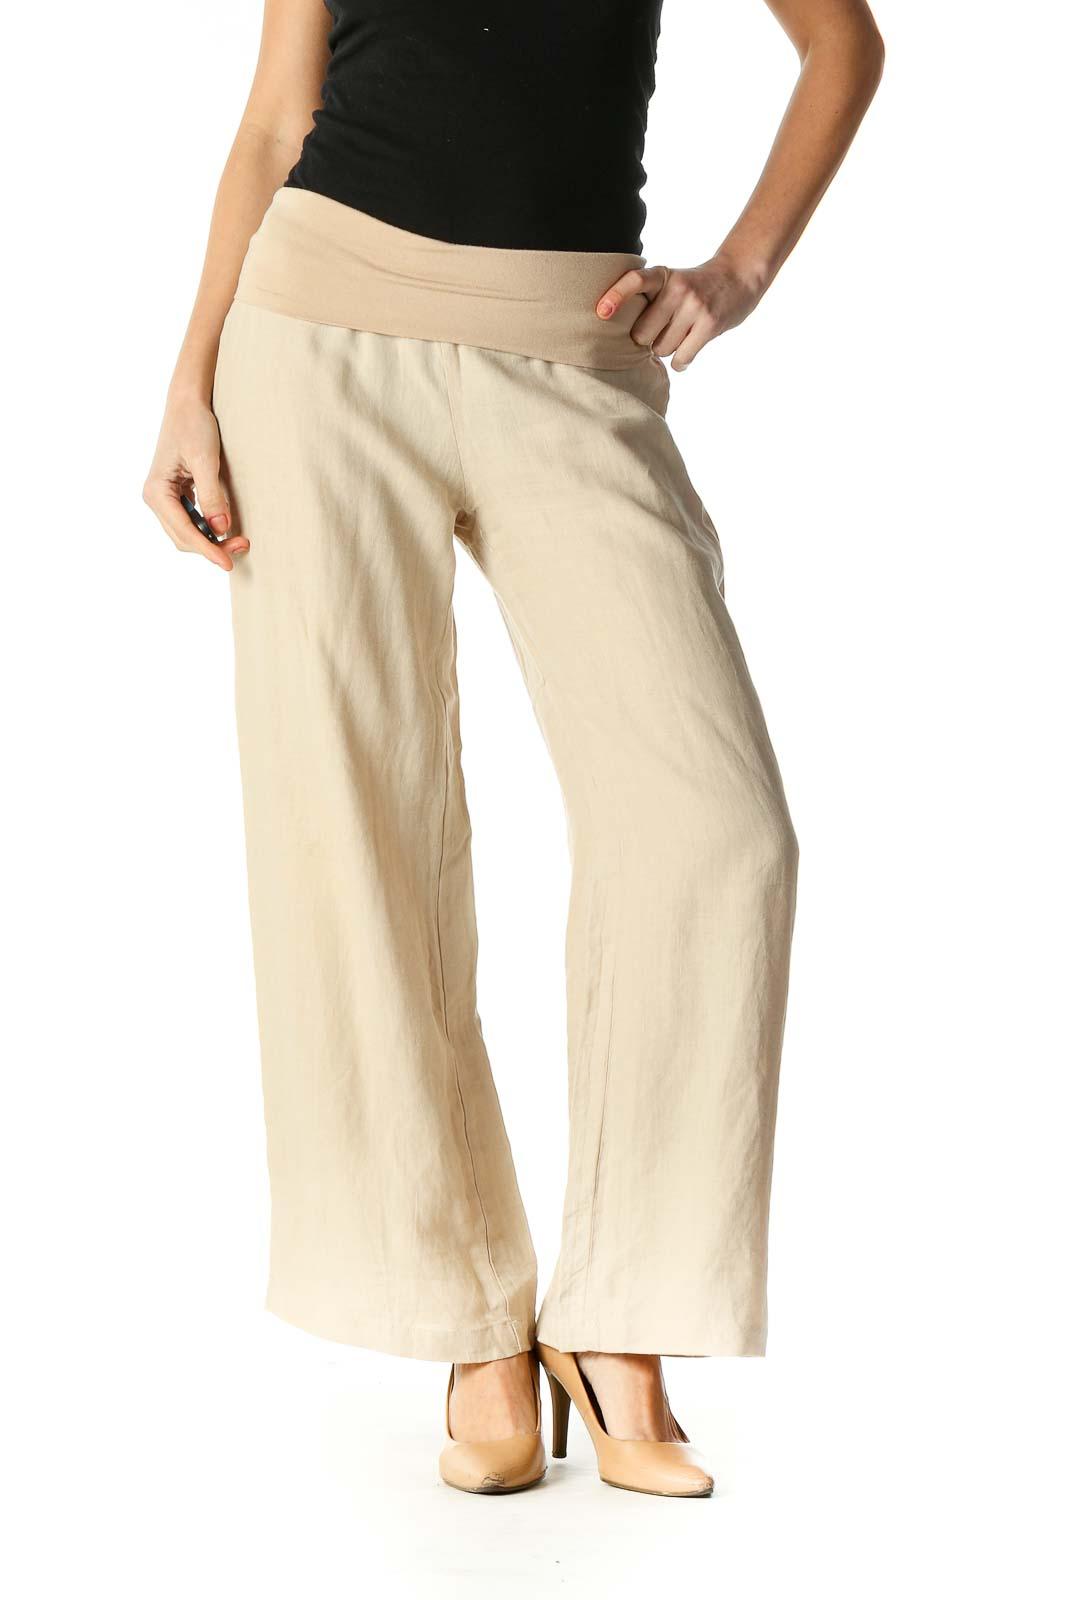 Beige Texture Casual Pants Front